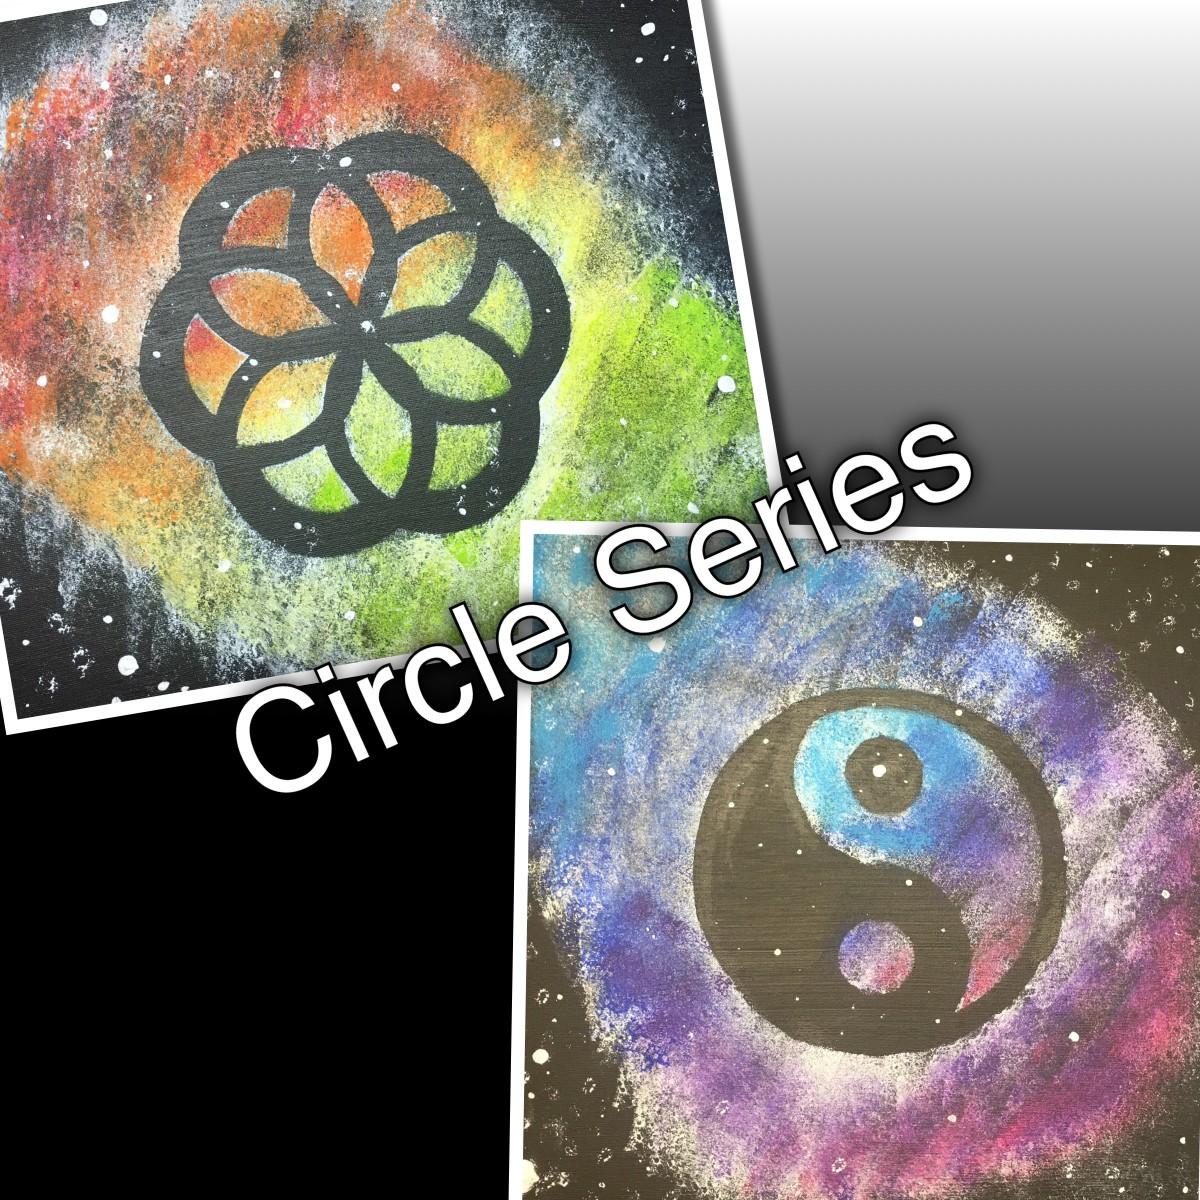 Designs based off of circles using handmade stencils.